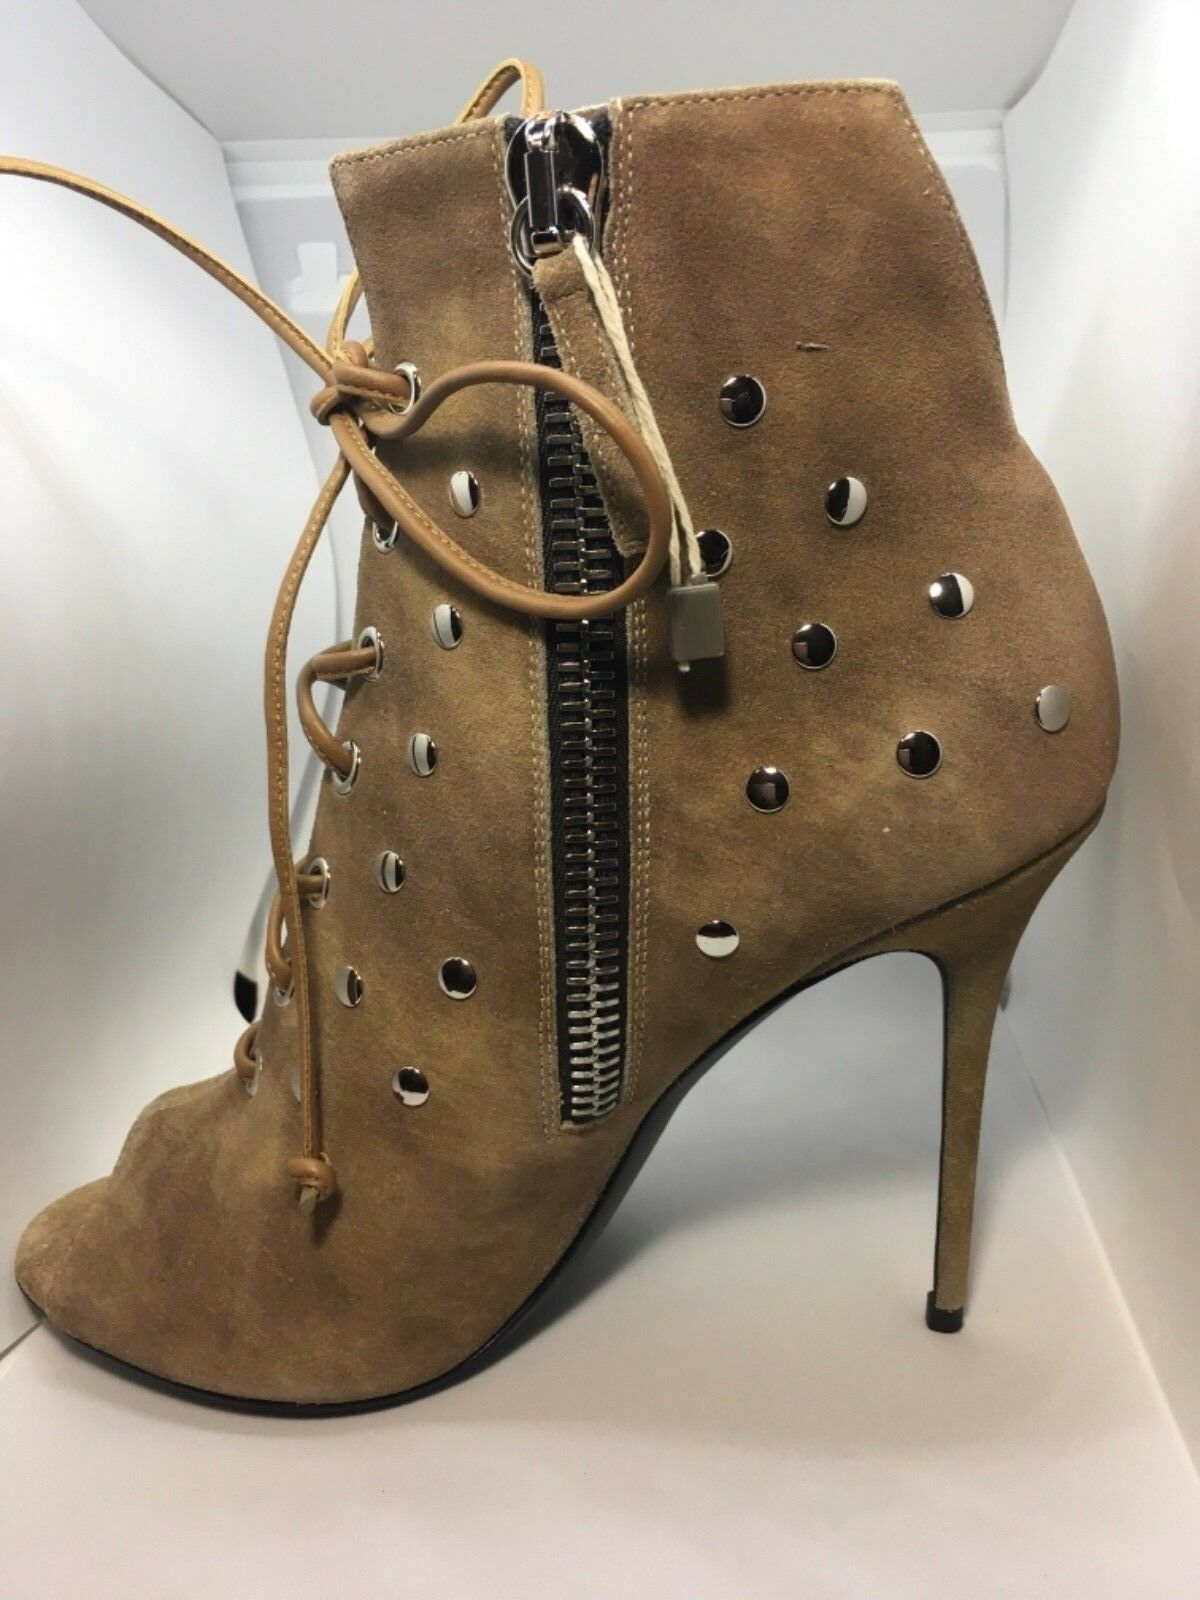 GIUSEPPE ZANOTTI LEATHER ANKLE Stiefel StiefelIES StiefelIES StiefelIES HEELS schuhe Größe 38EU NIB 5c3dc3